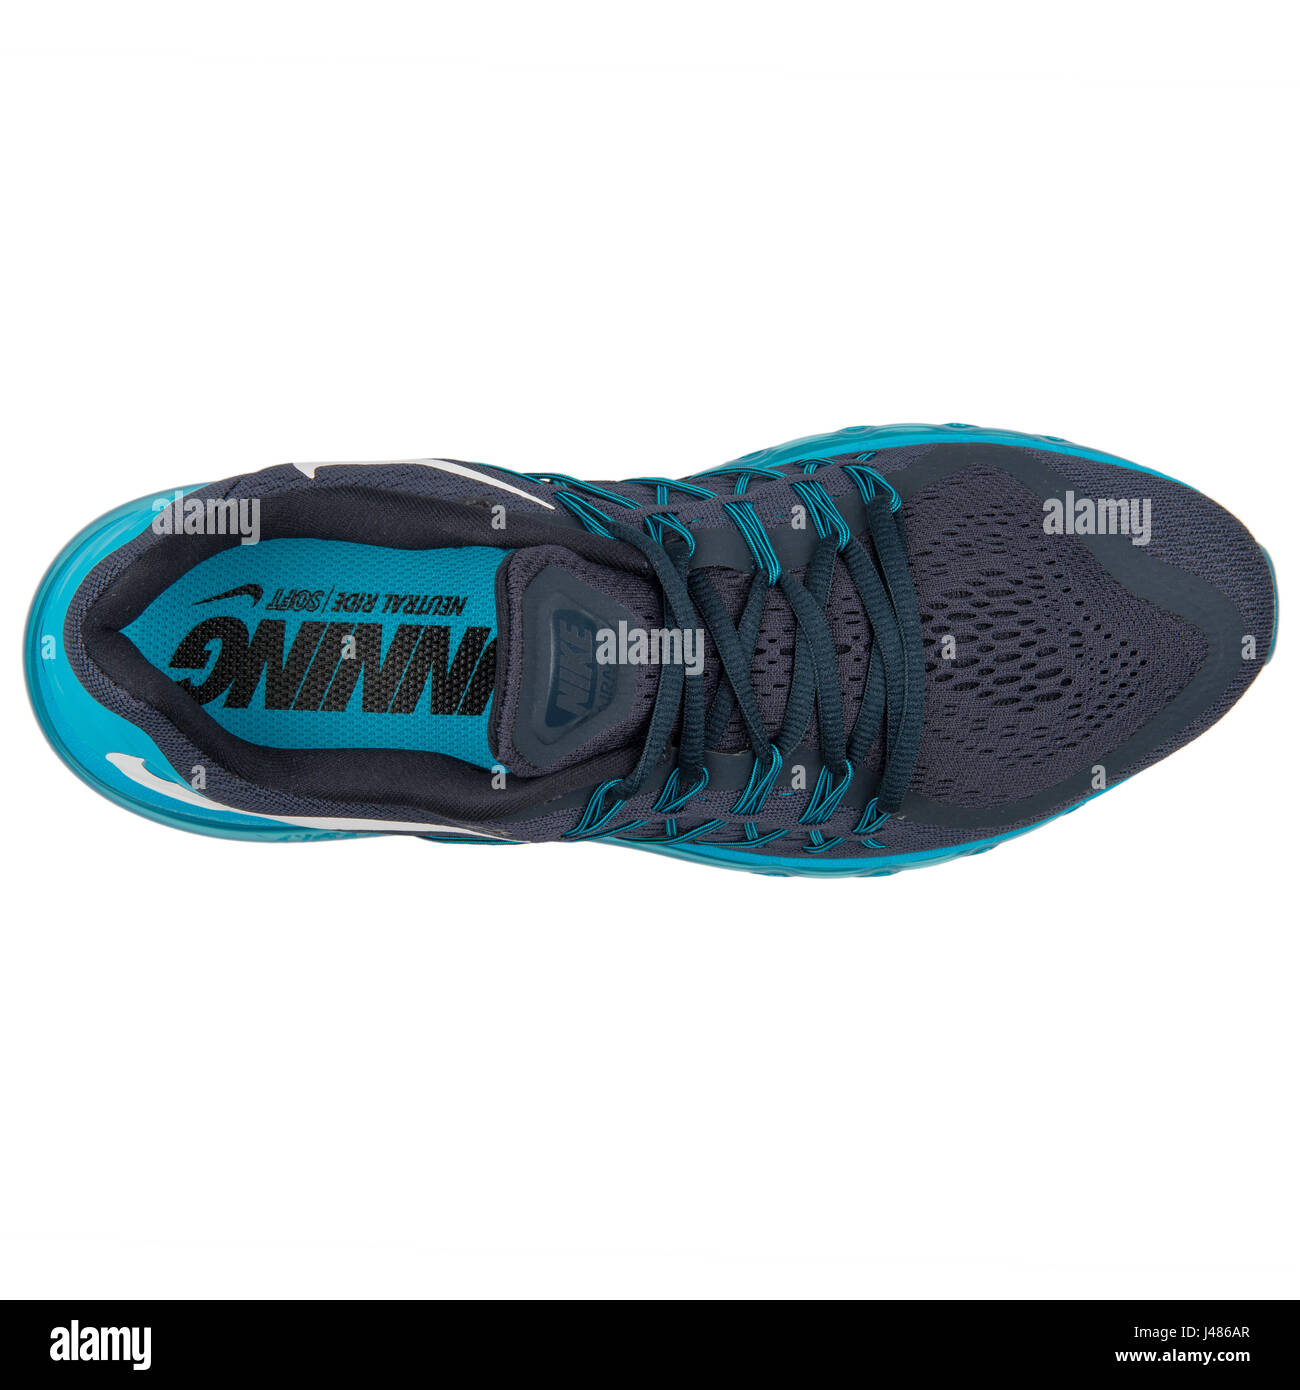 Nike Air Shoe Imágenes De Stock & Nike Air Shoe Fotos De